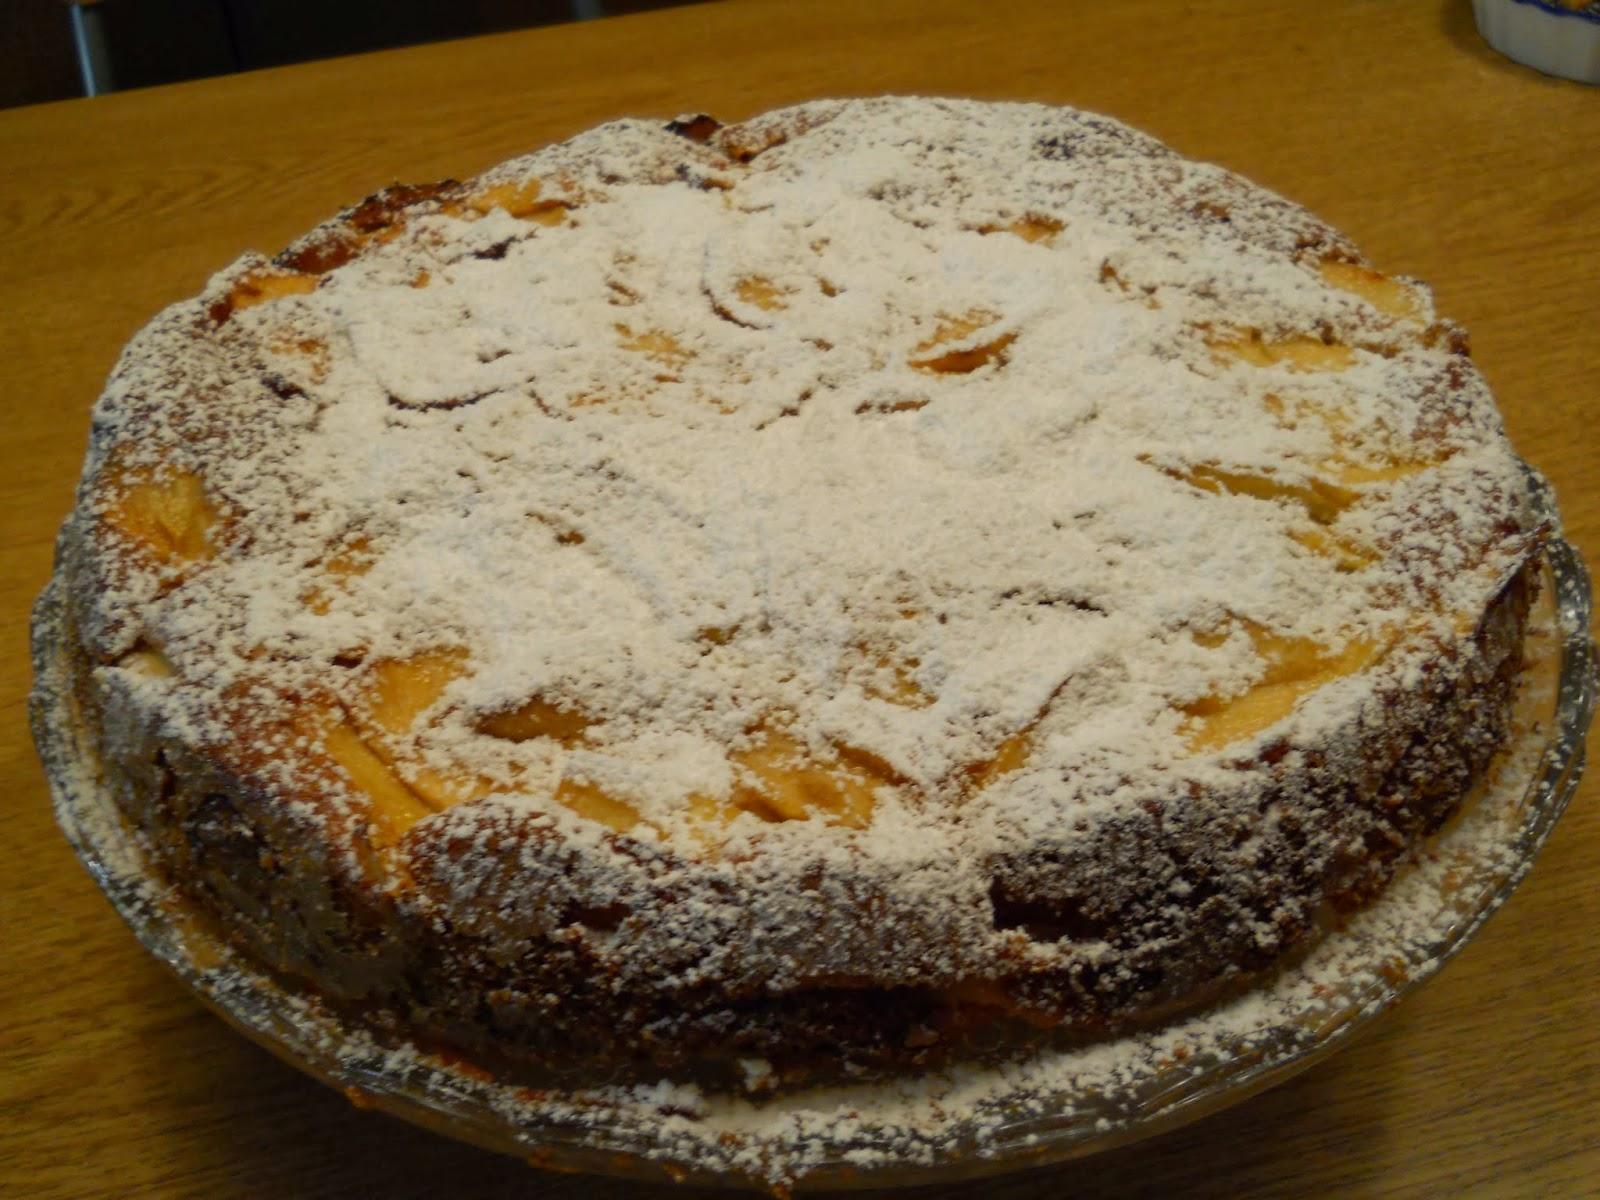 Rilassarsi tra i fornelli la cucina di silvana torta di mele cremosa - Silvana in cucina ...